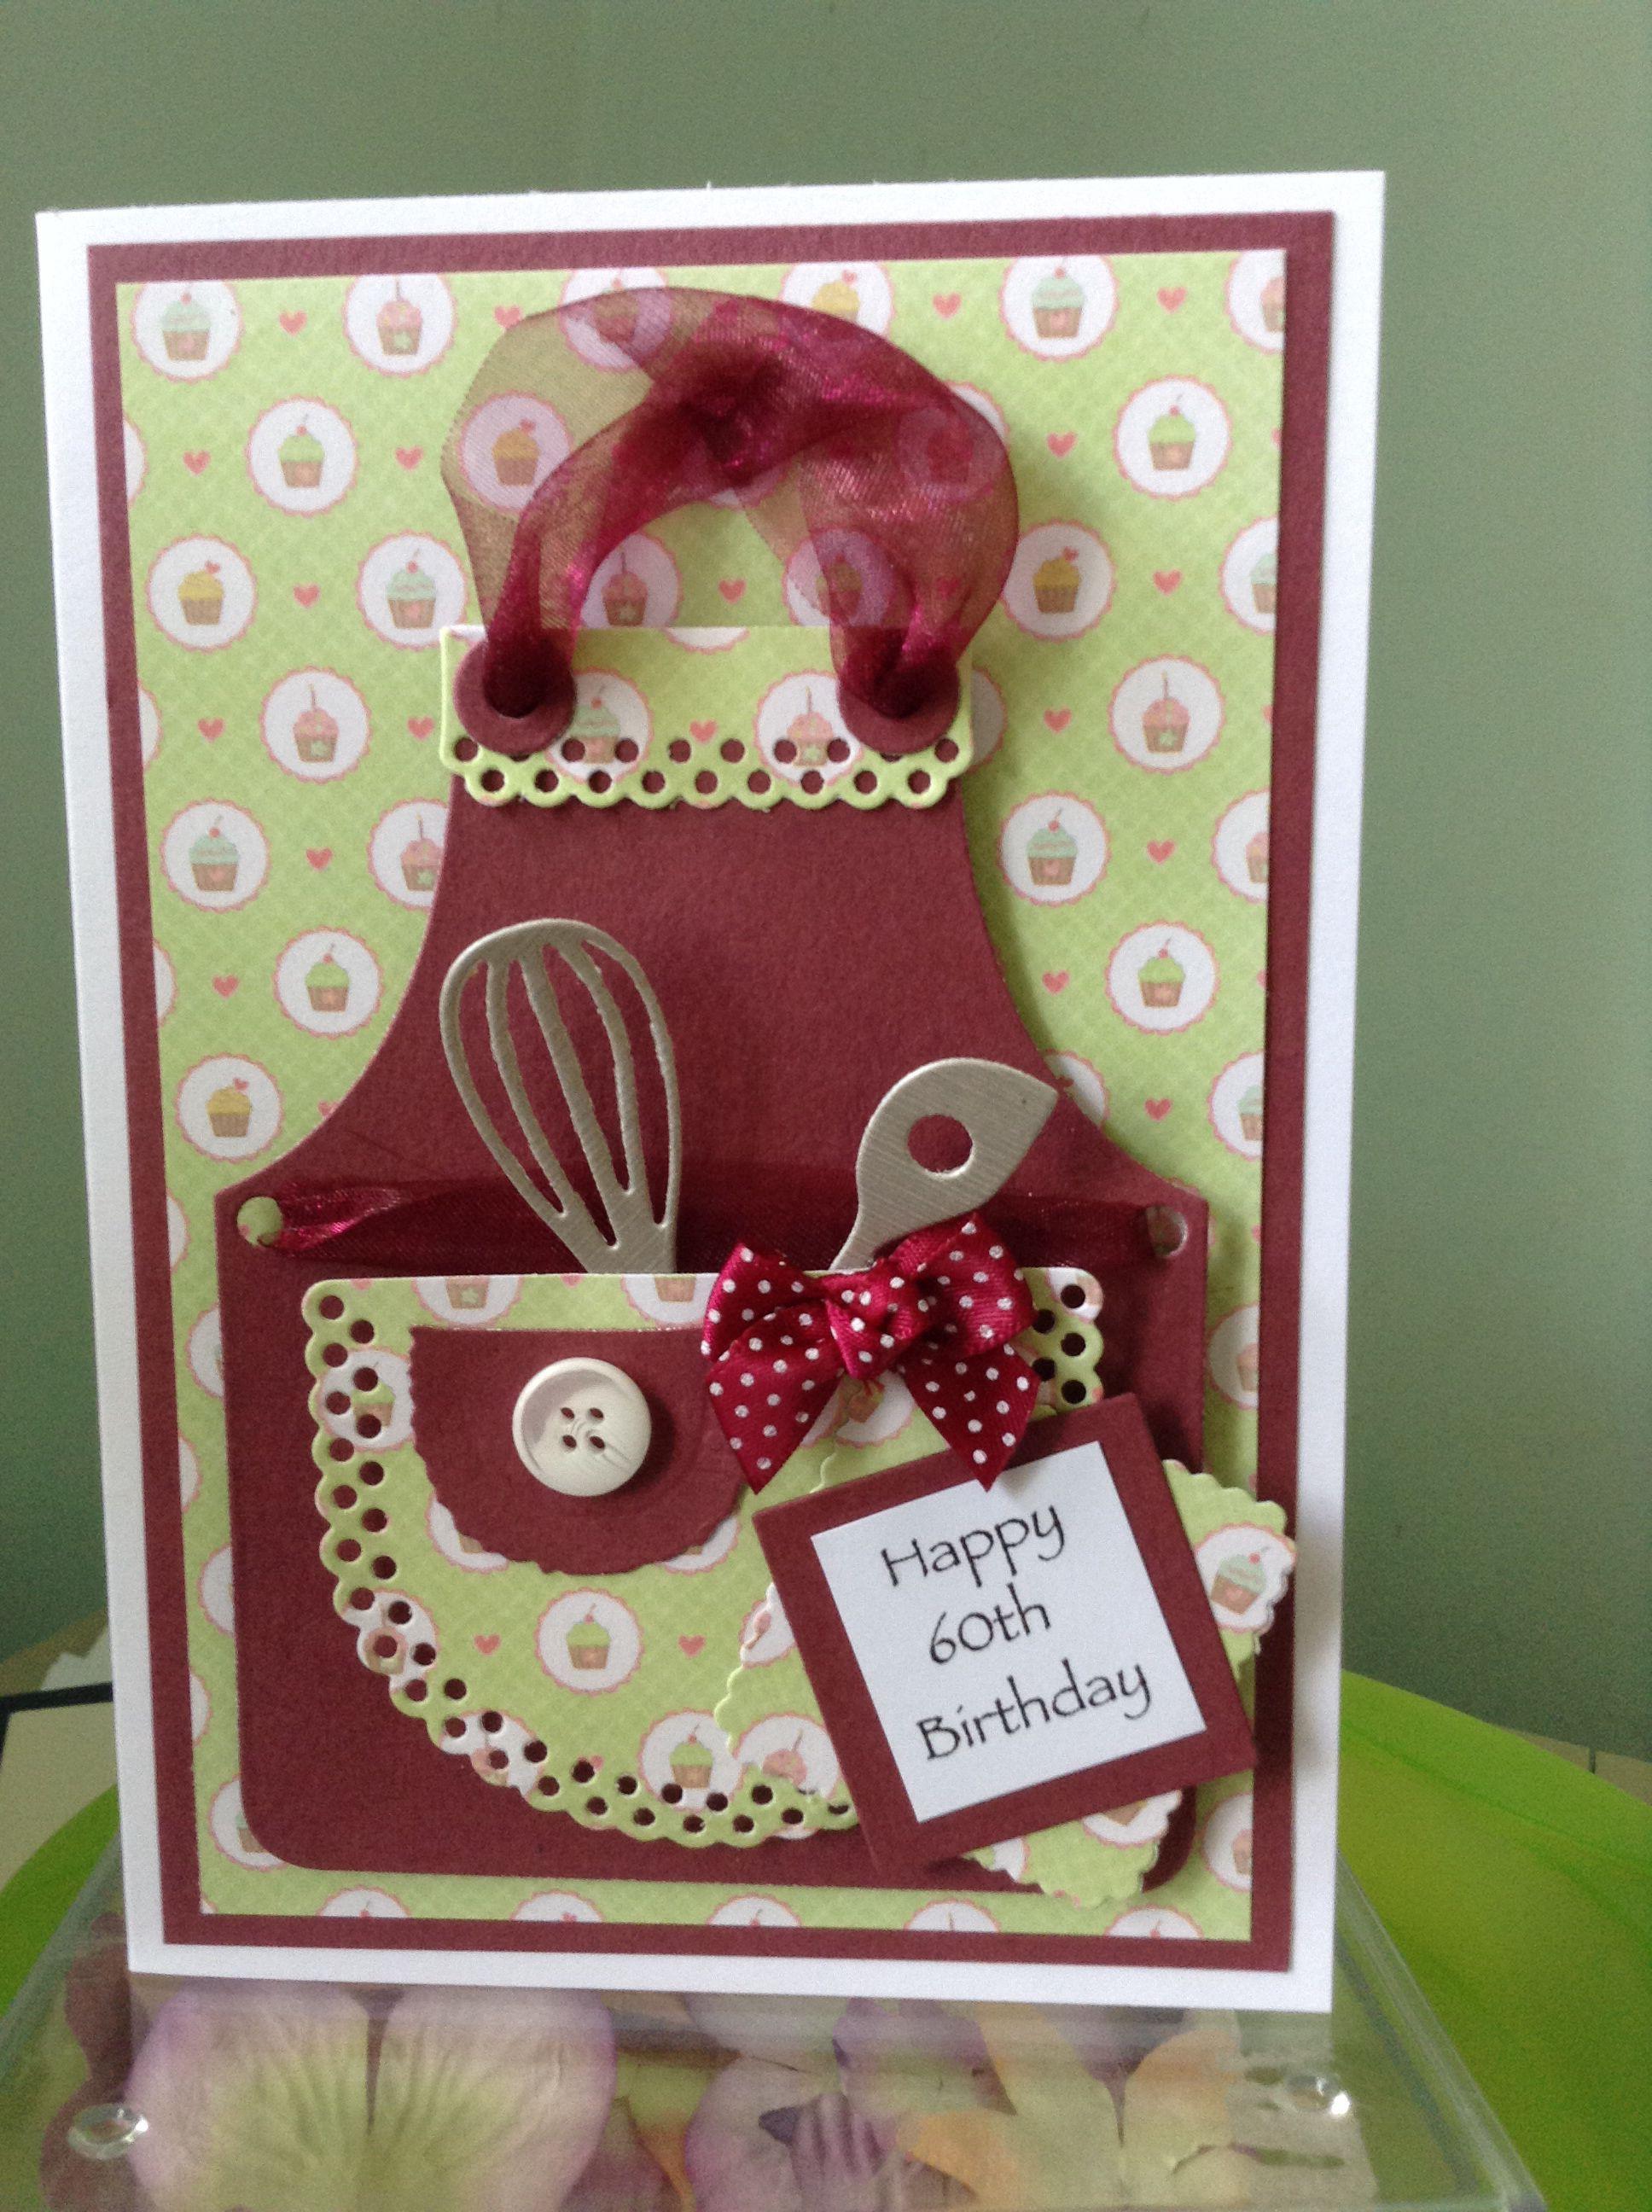 Apron 60th Birthday Banner Pinterest Apron Birthdays And Cards